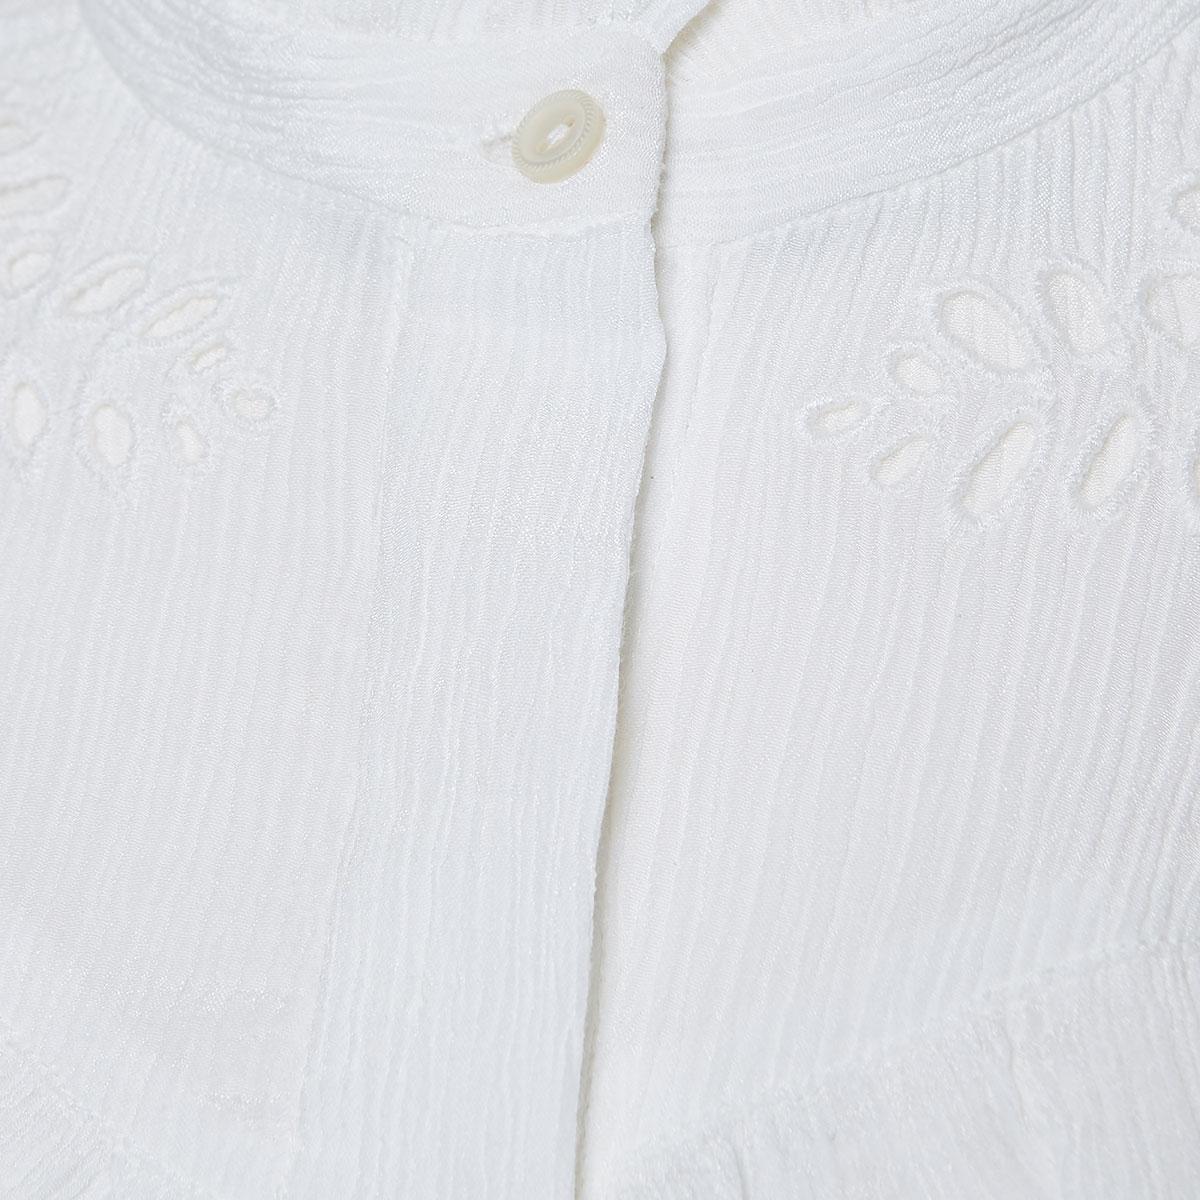 Izae ruffled crinkled shirt